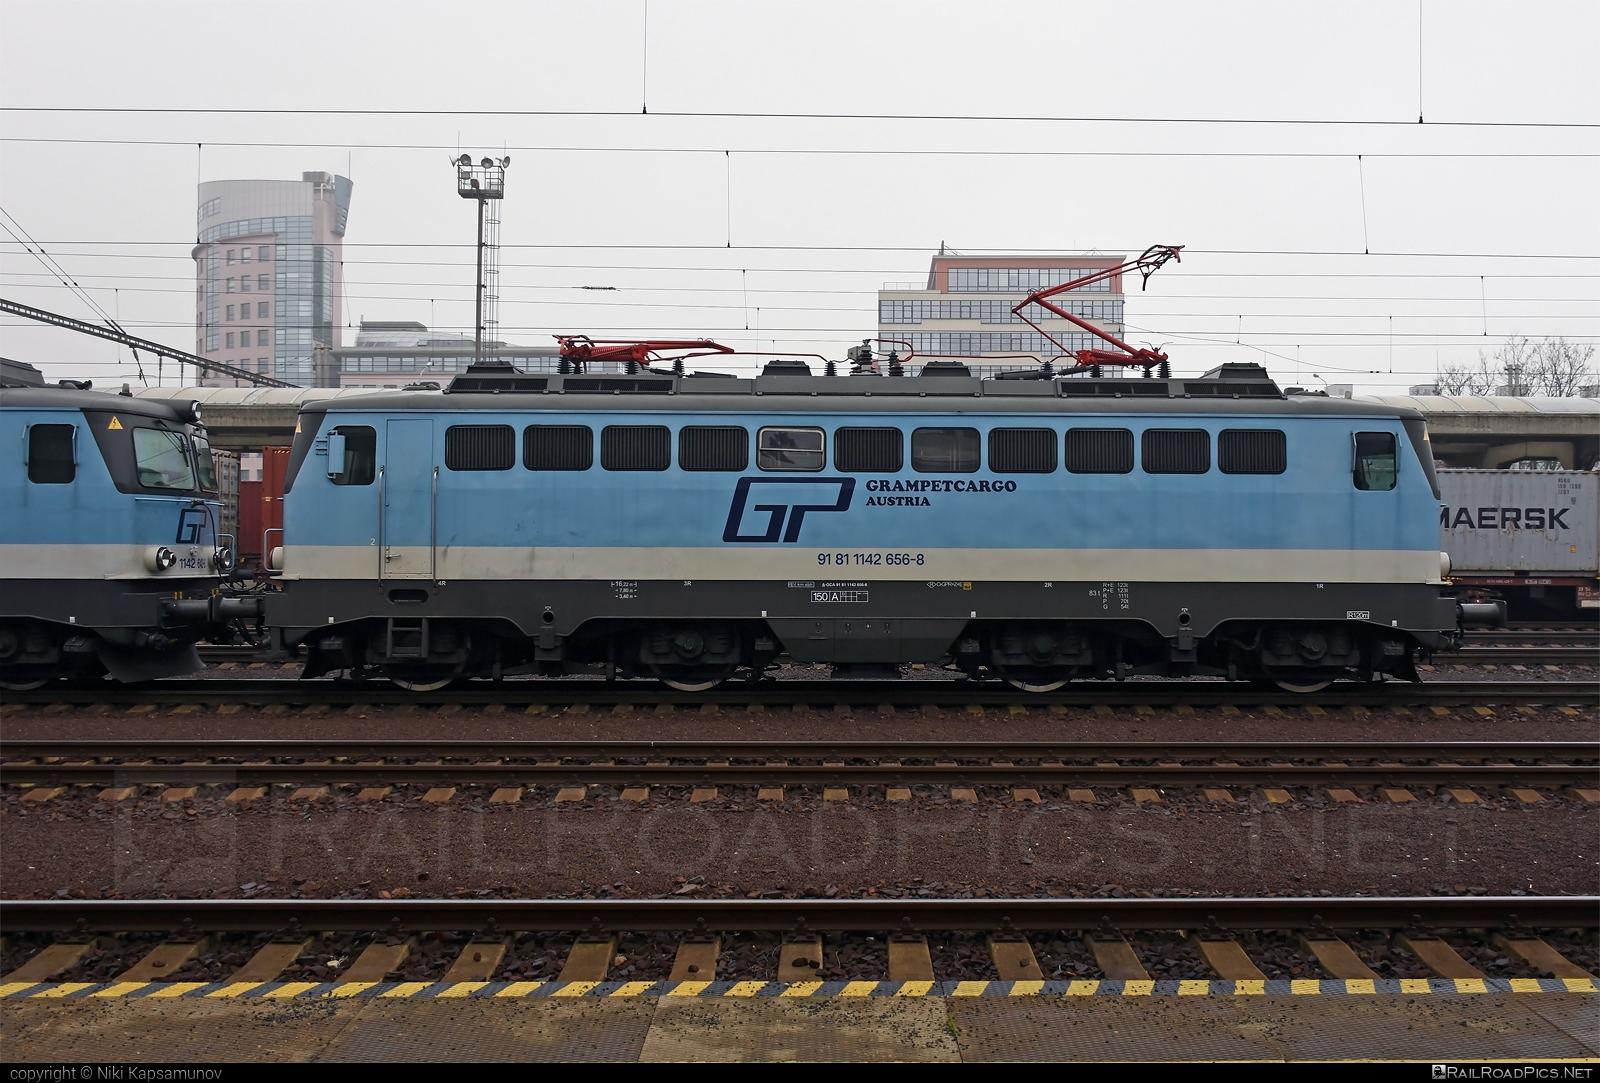 SGP ÖBB Class 1142 - 1142 656-8 operated by Grampetcargo Austria #GrampetcargoAustria #grampetcargo #obbclass1142 #sgp #sgp1142 #simmeringgrazpauker